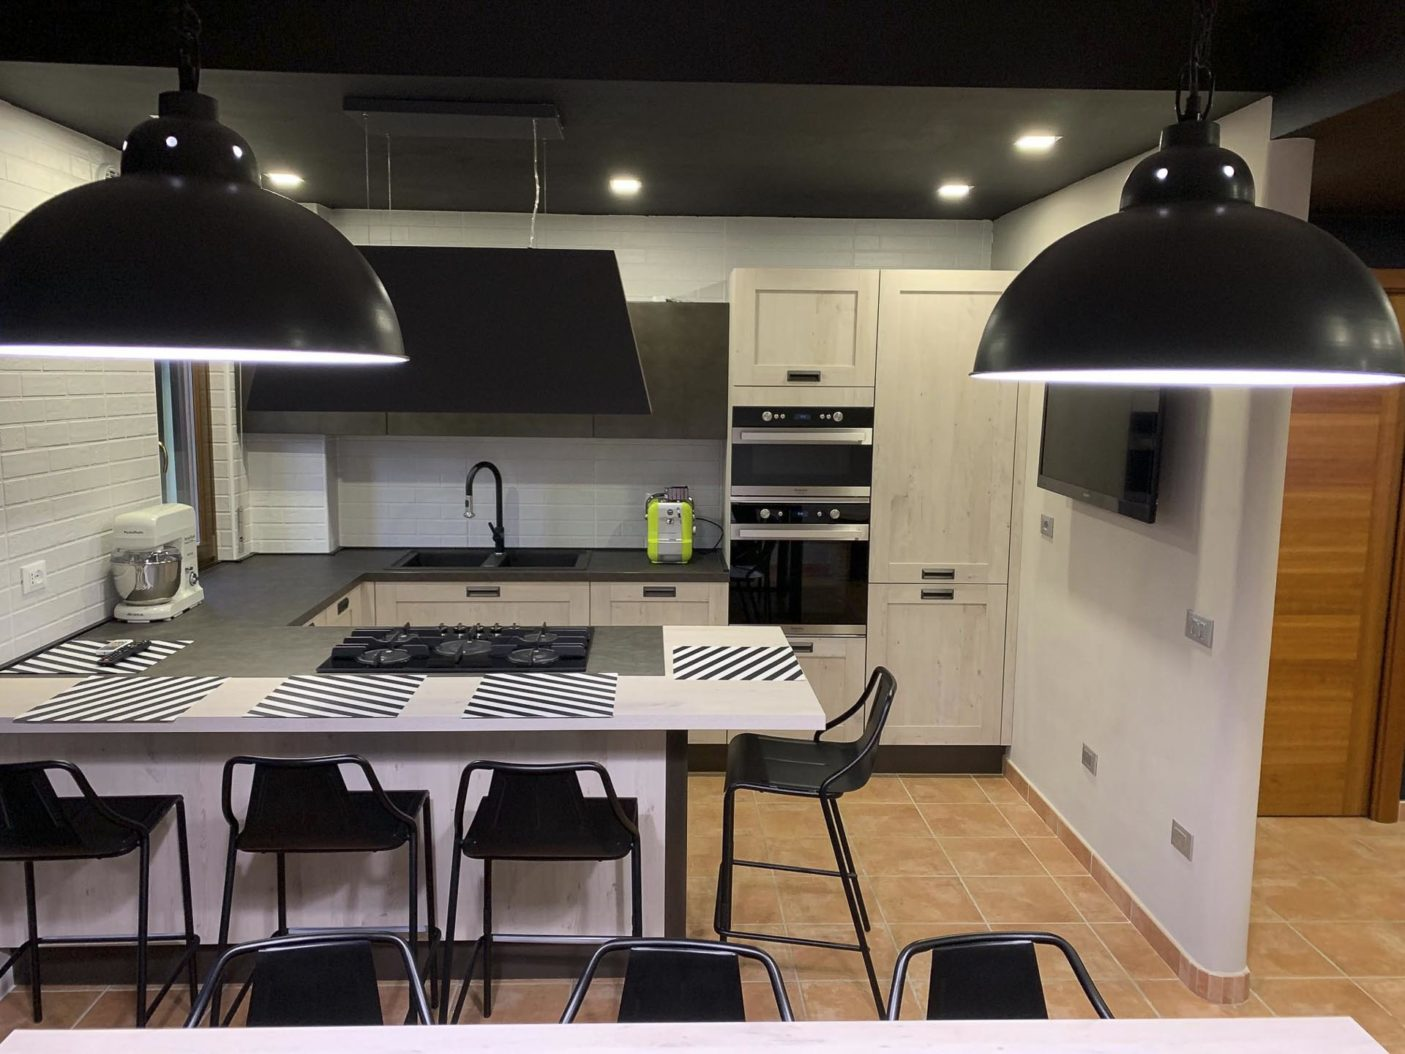 Cucina-Creo-Kitchens-Kyra-a-Telaio7.jpg